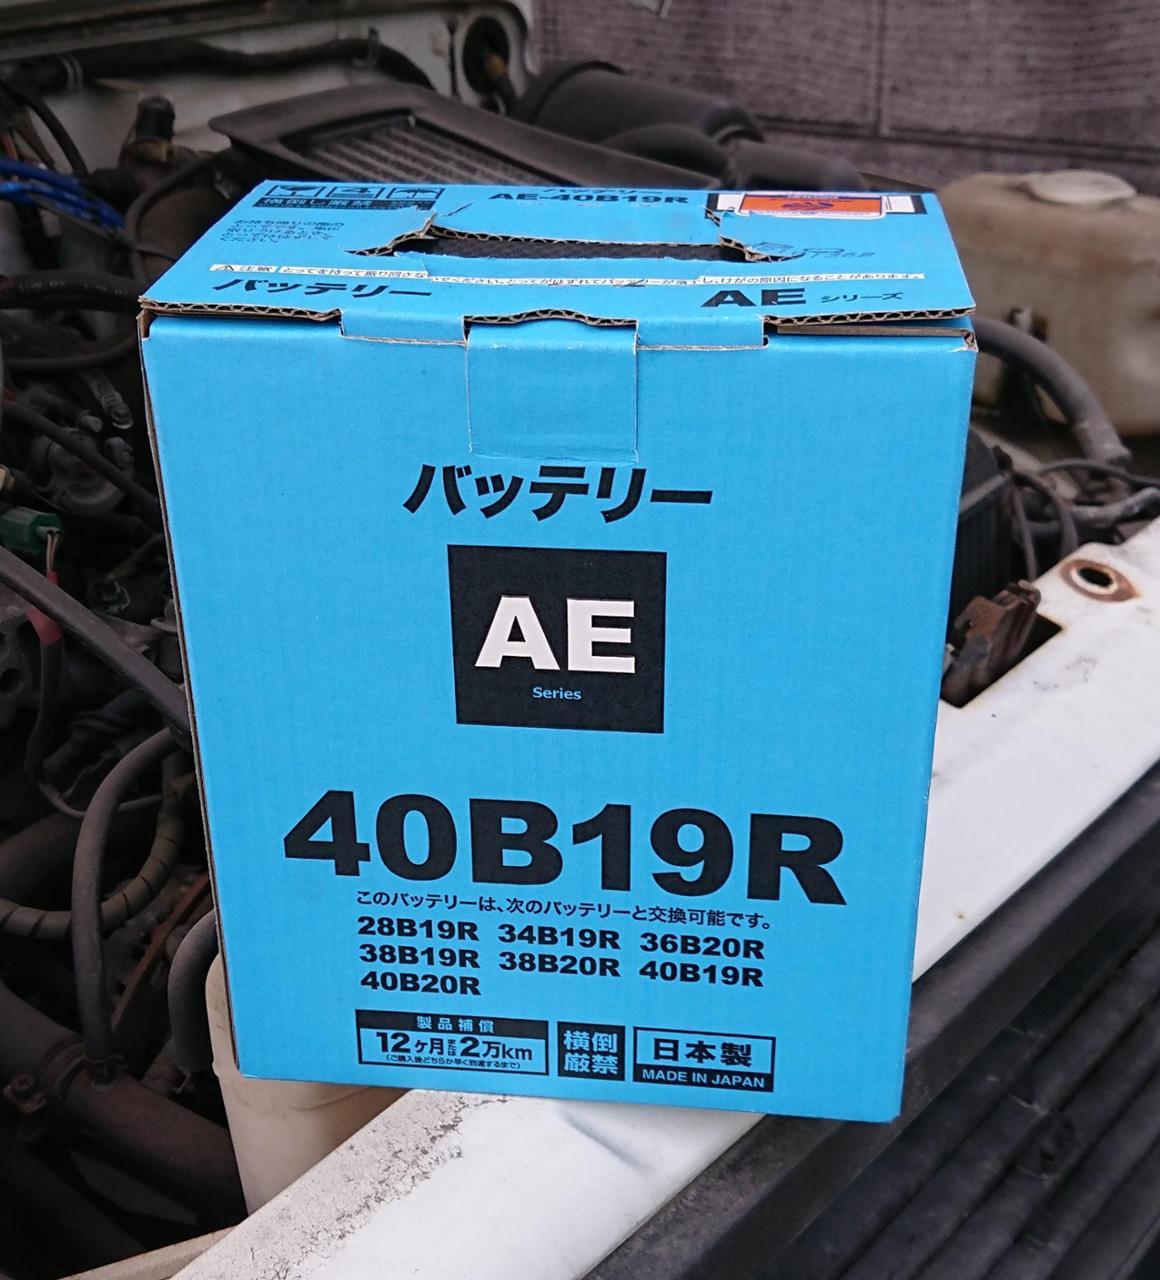 GS YUASA AE series 40B19R